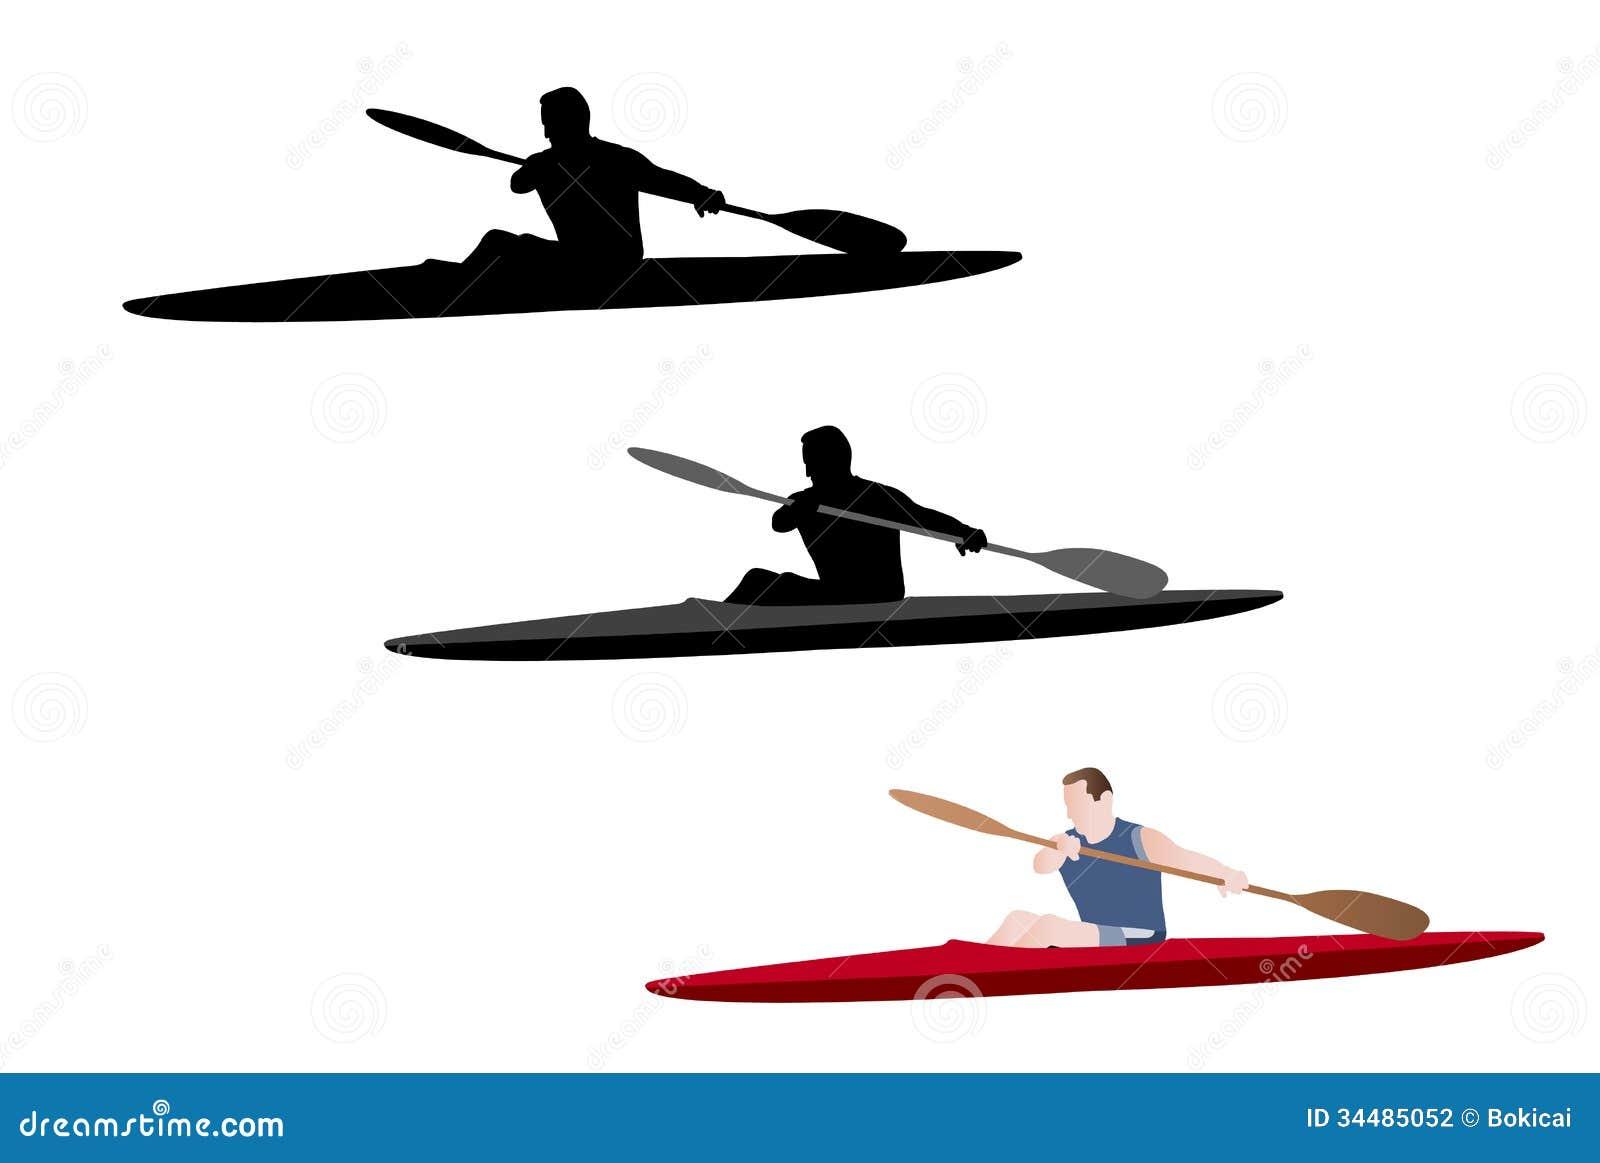 kayak clip art images - photo #40